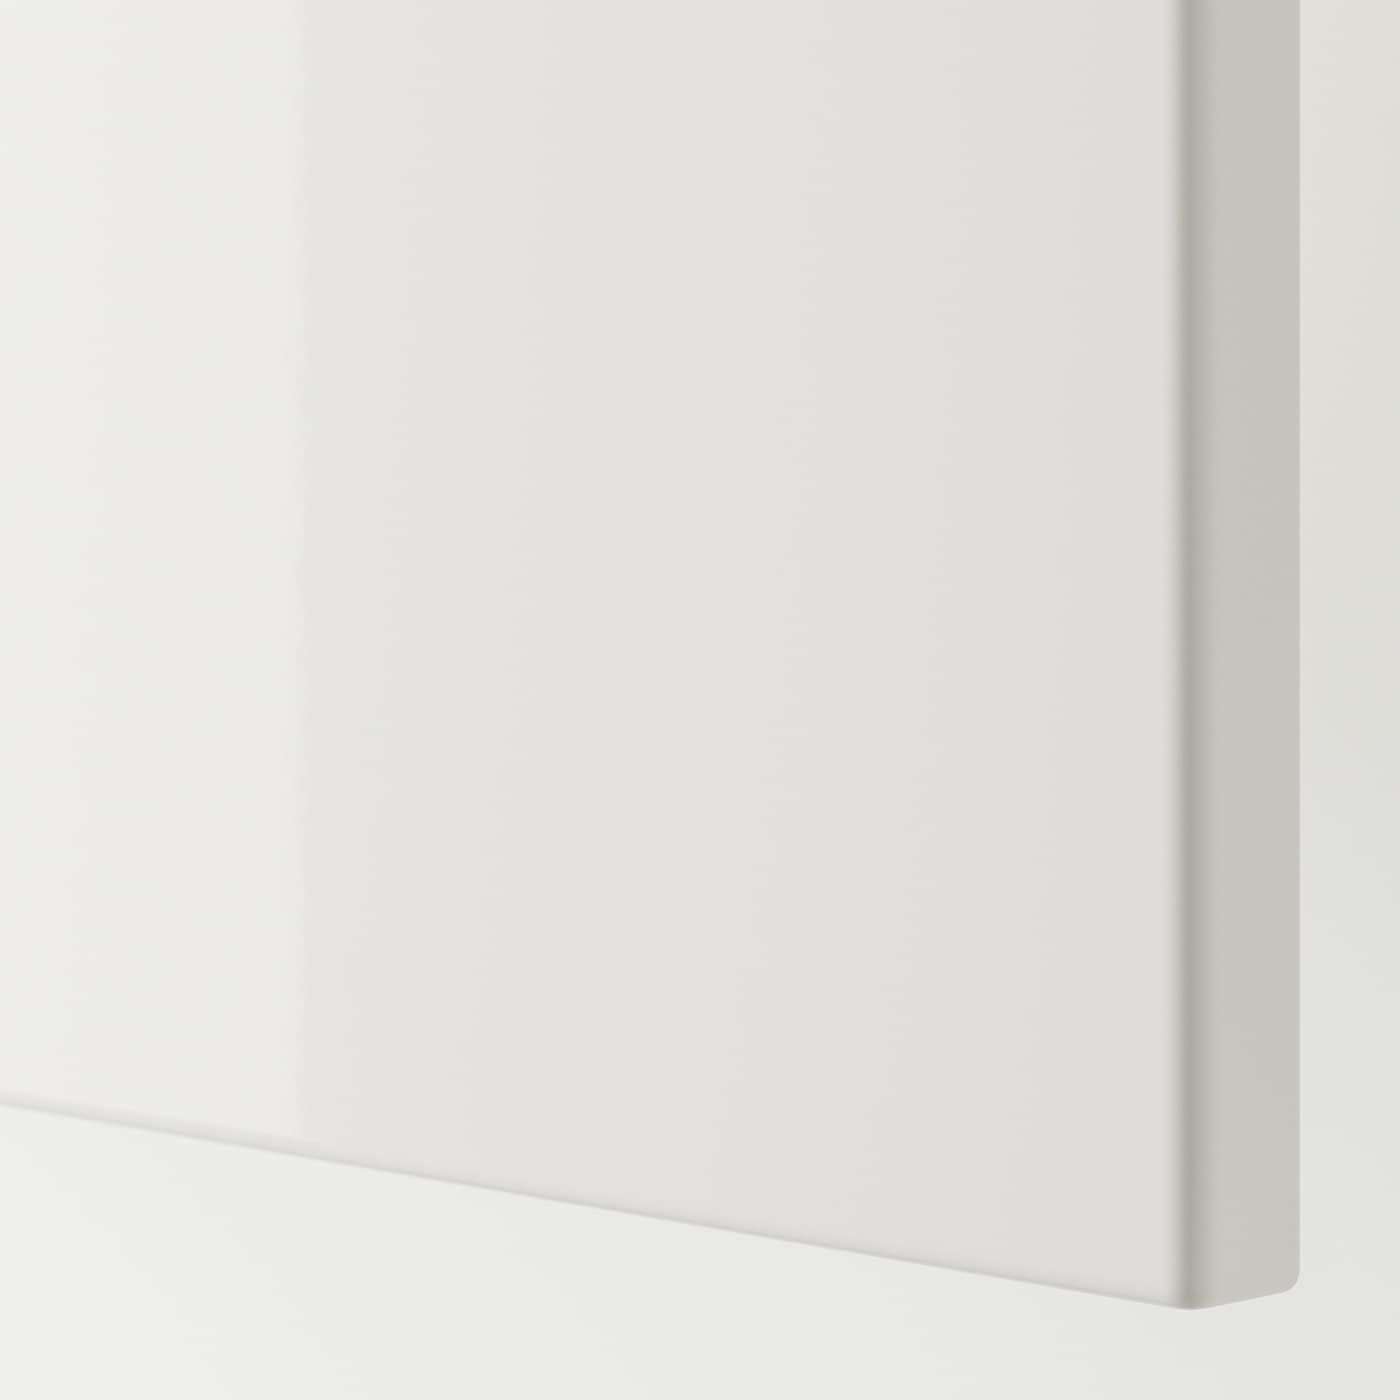 PAX white, Fardal Vikedal, Wardrobe